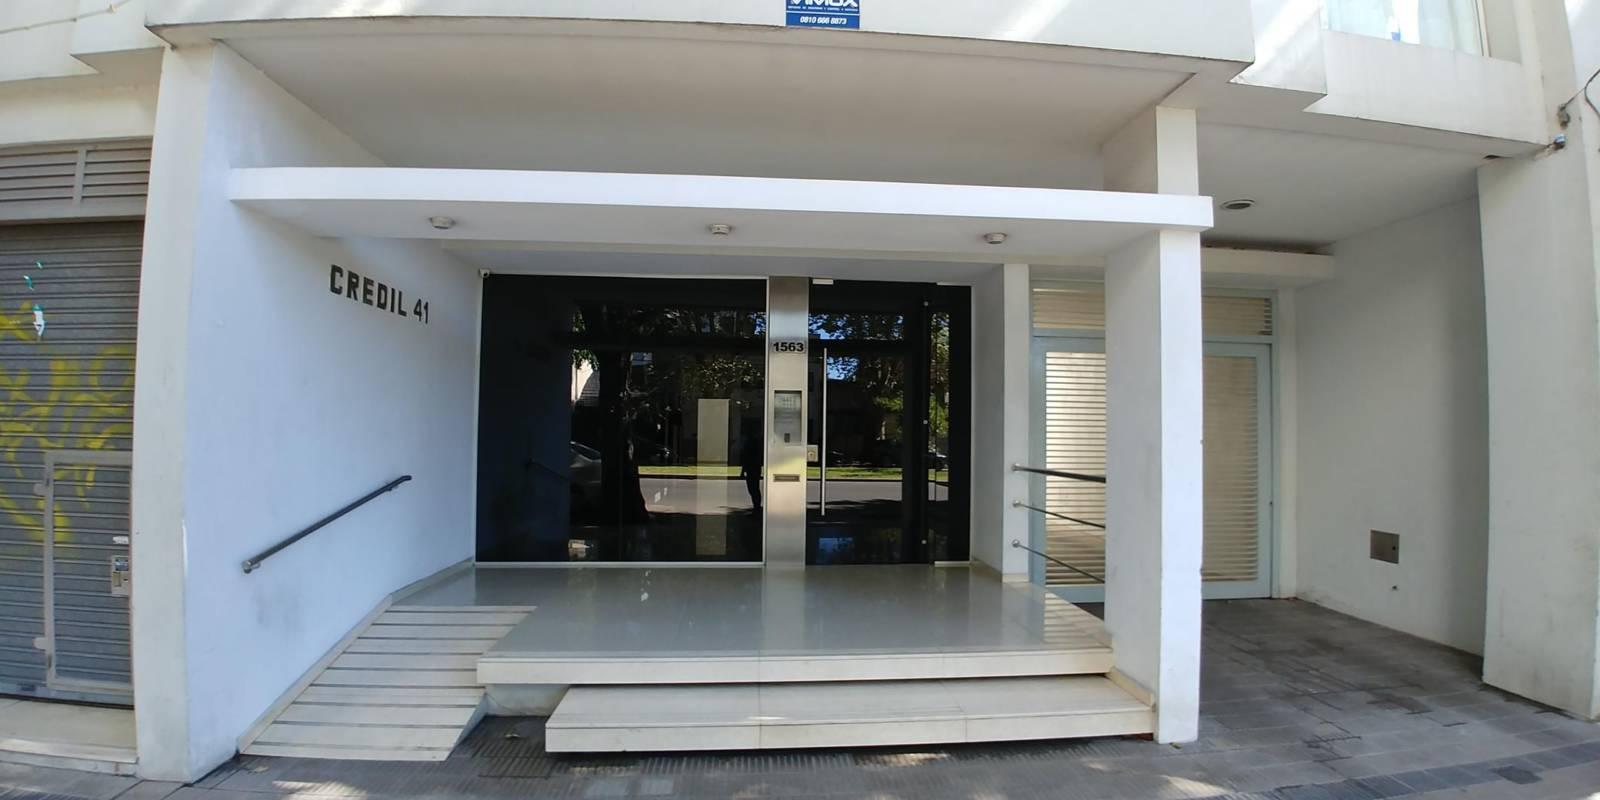 Departamento en venta – Avenida 1 e/64 y 65 – La Plata | Larrosa